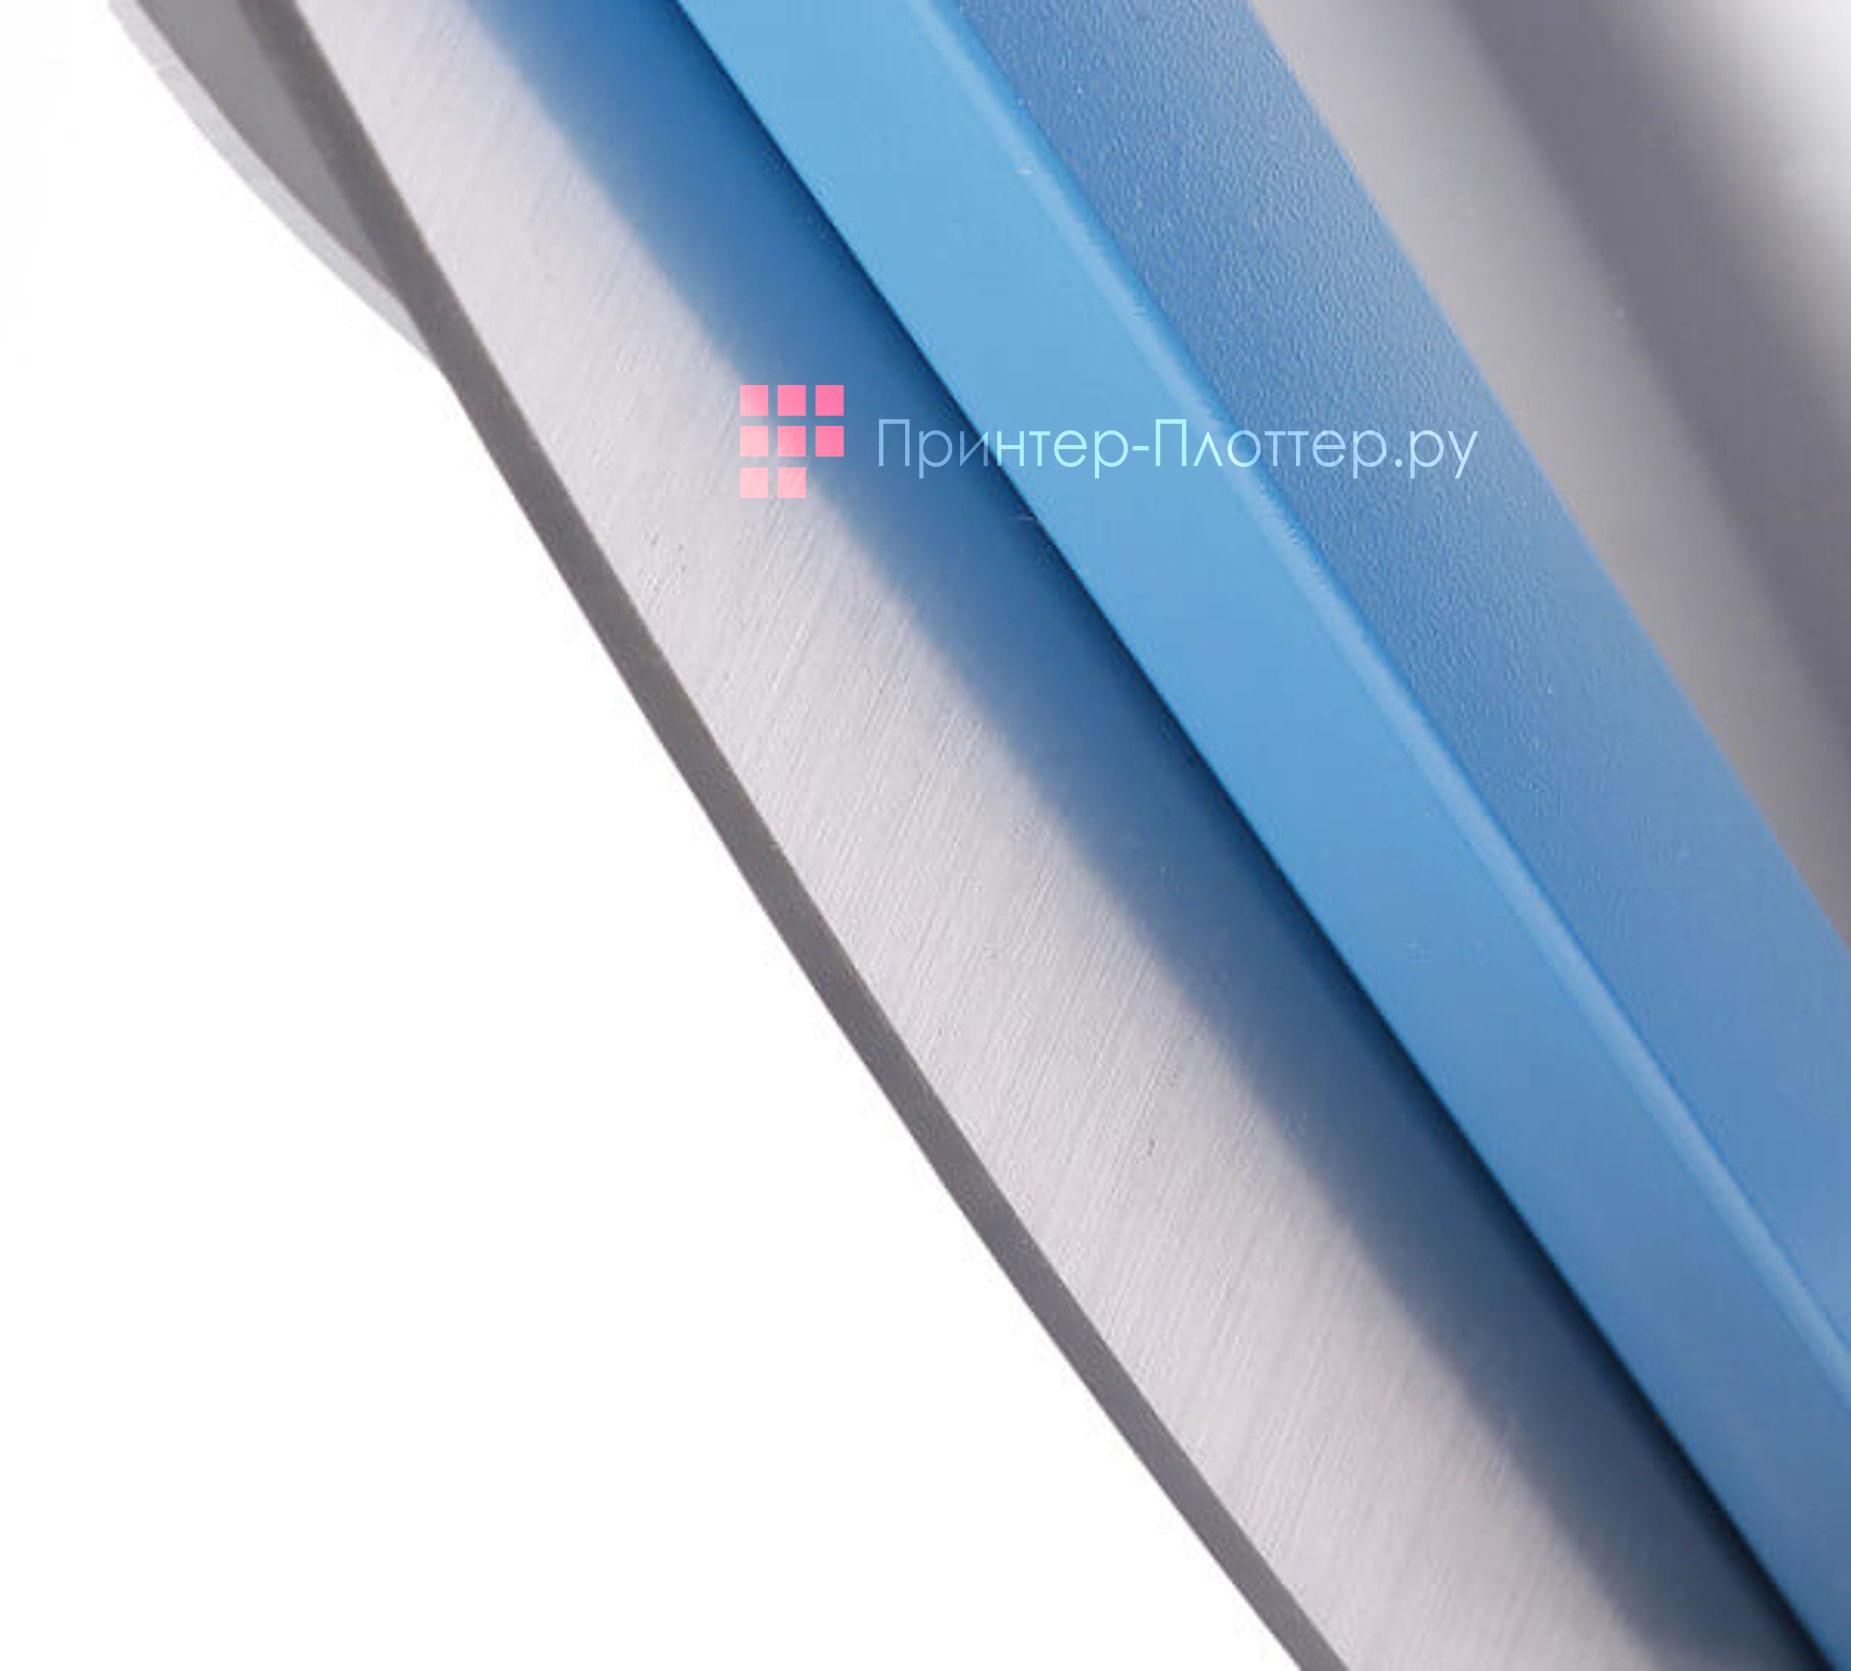 Dahle 534. Нож для материалов